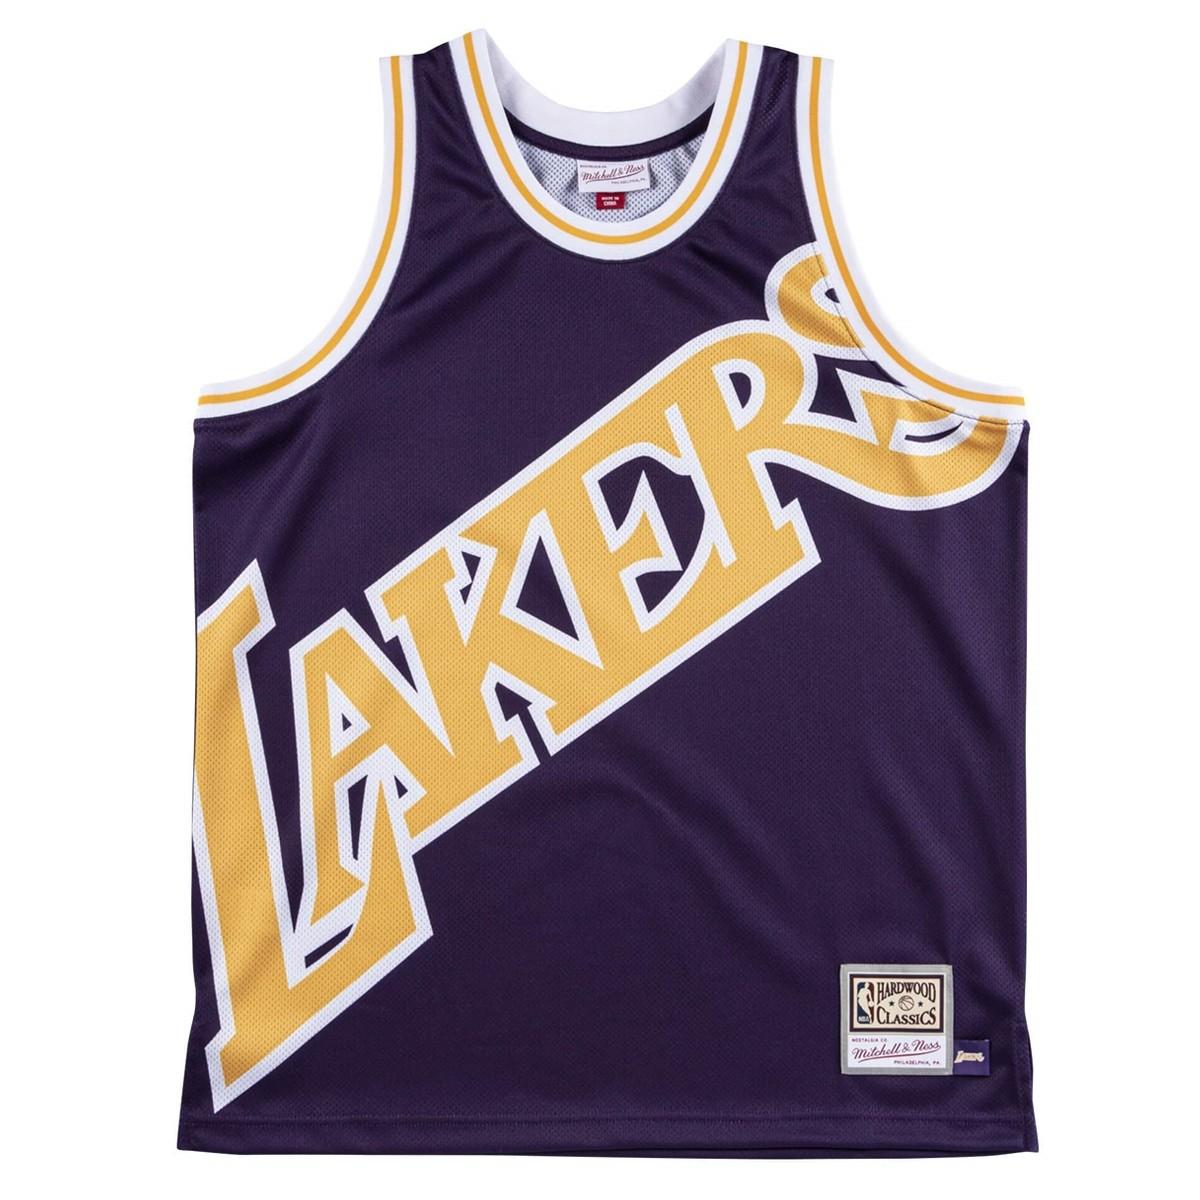 Mitchell & Ness Big Face Jersey 'Lakers'